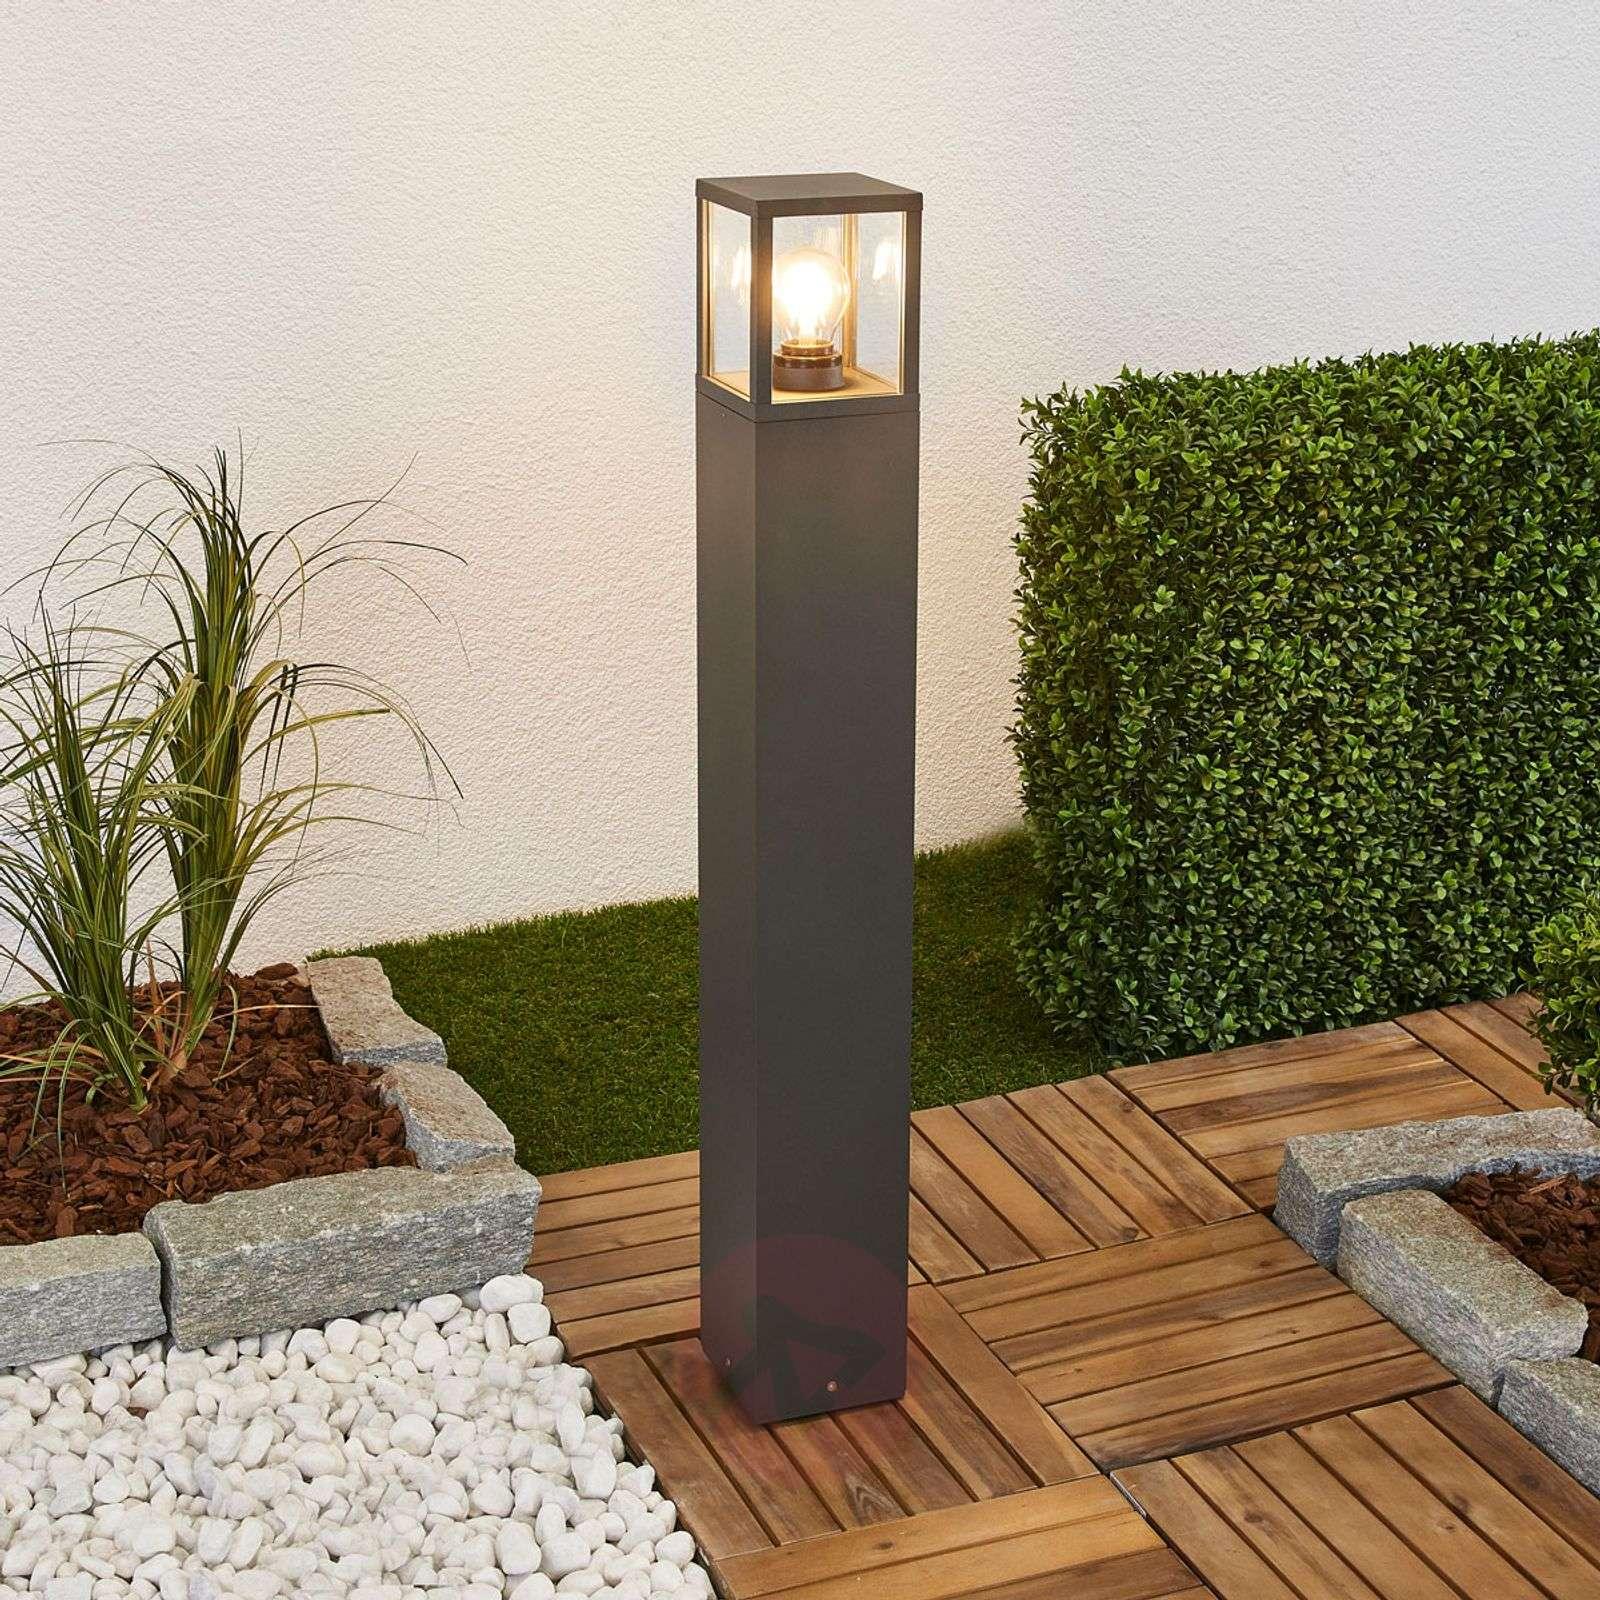 Klemens bollard light with graphite grey surface-9616127-01